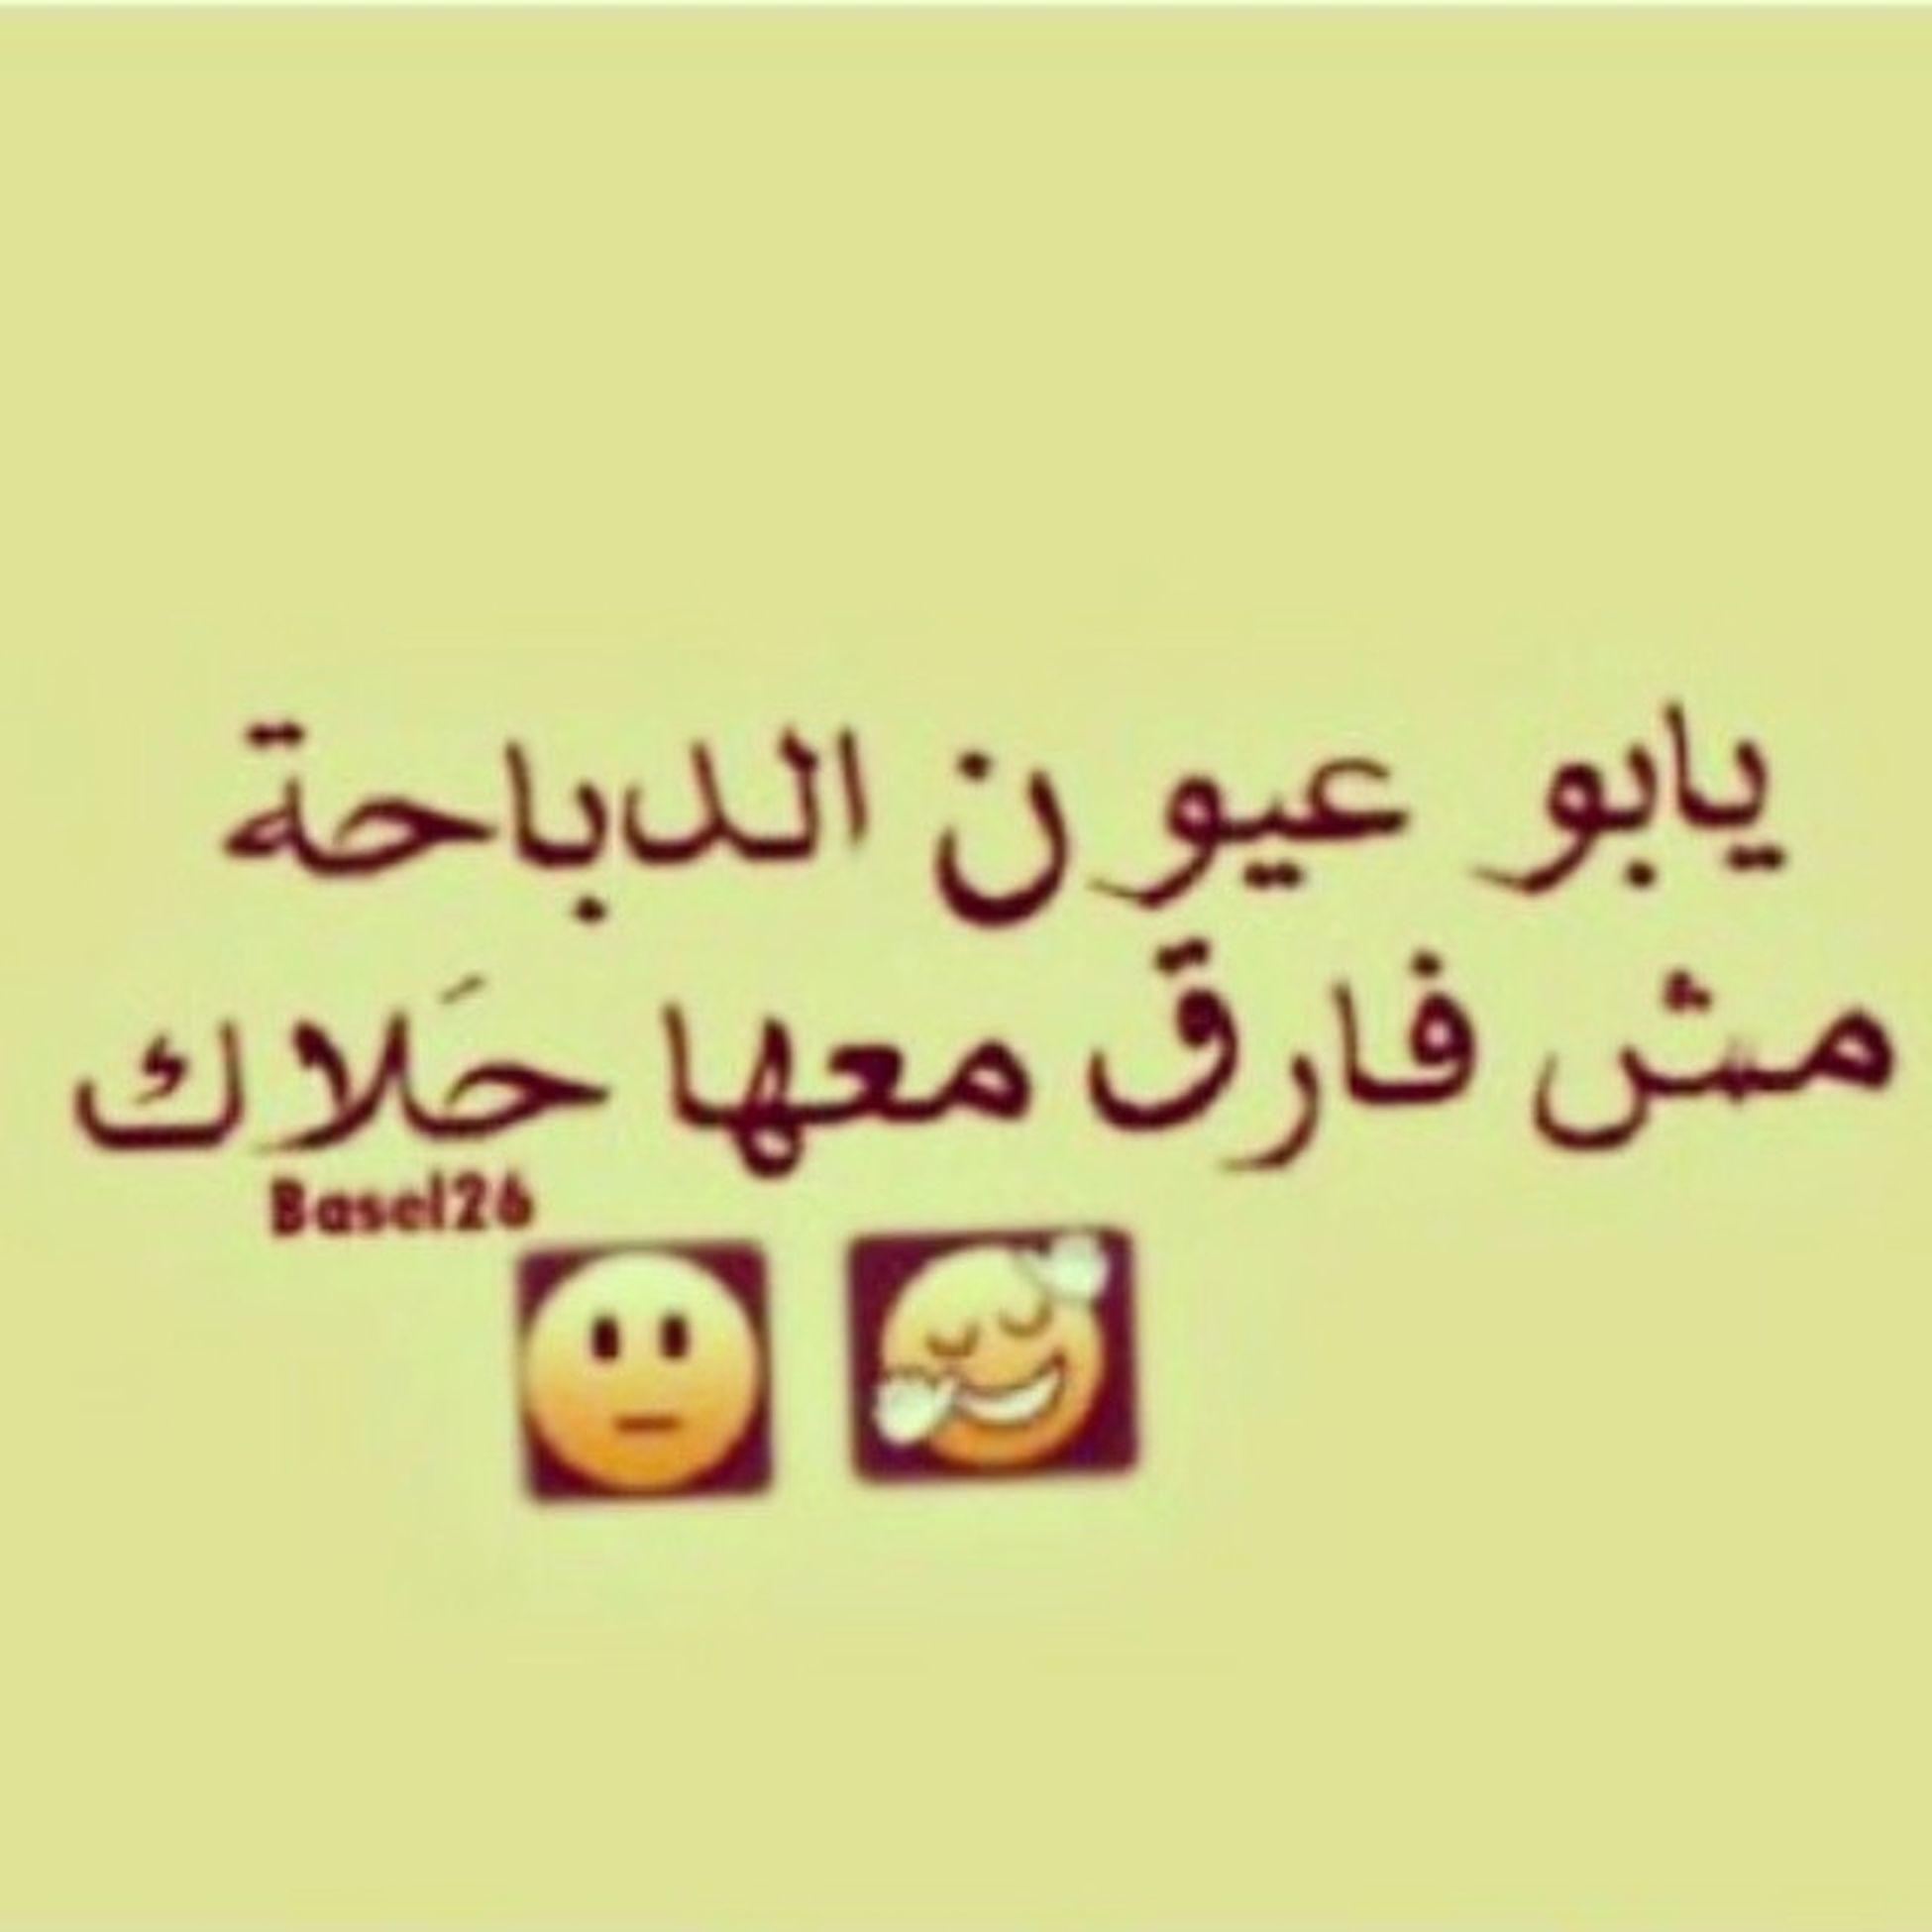 Ziadrahbani Song Great Mood Abu lzouz ziad rahbani good ziad_rahbani